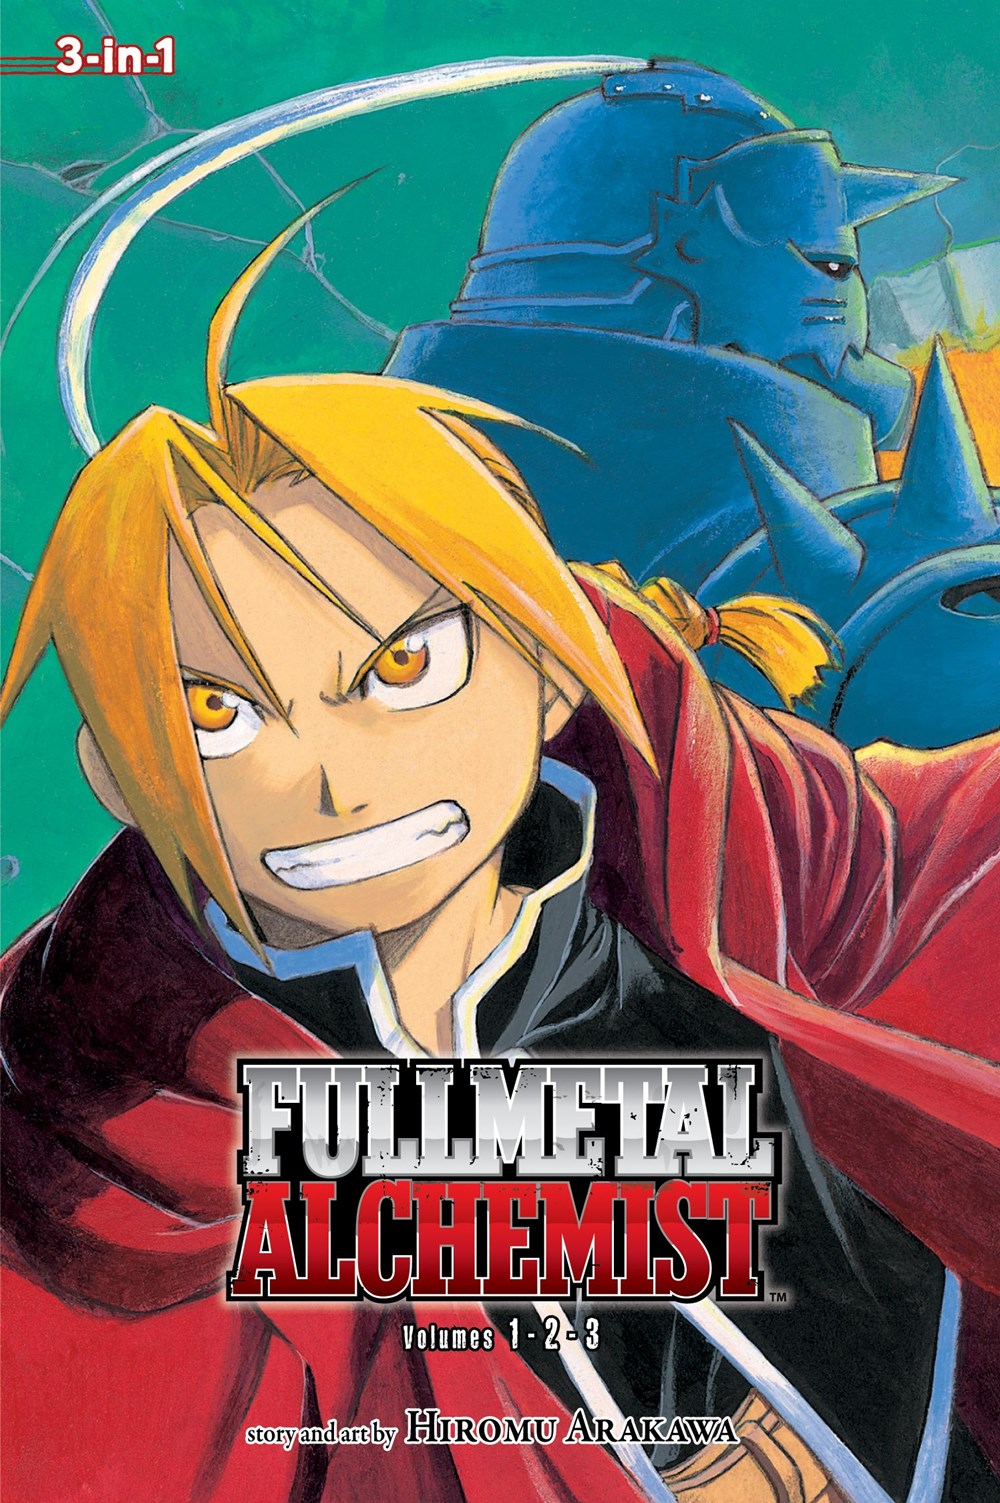 Fullmetal Alchemist (3-In-1 Edition): Includes Vols. 1  2 & 3